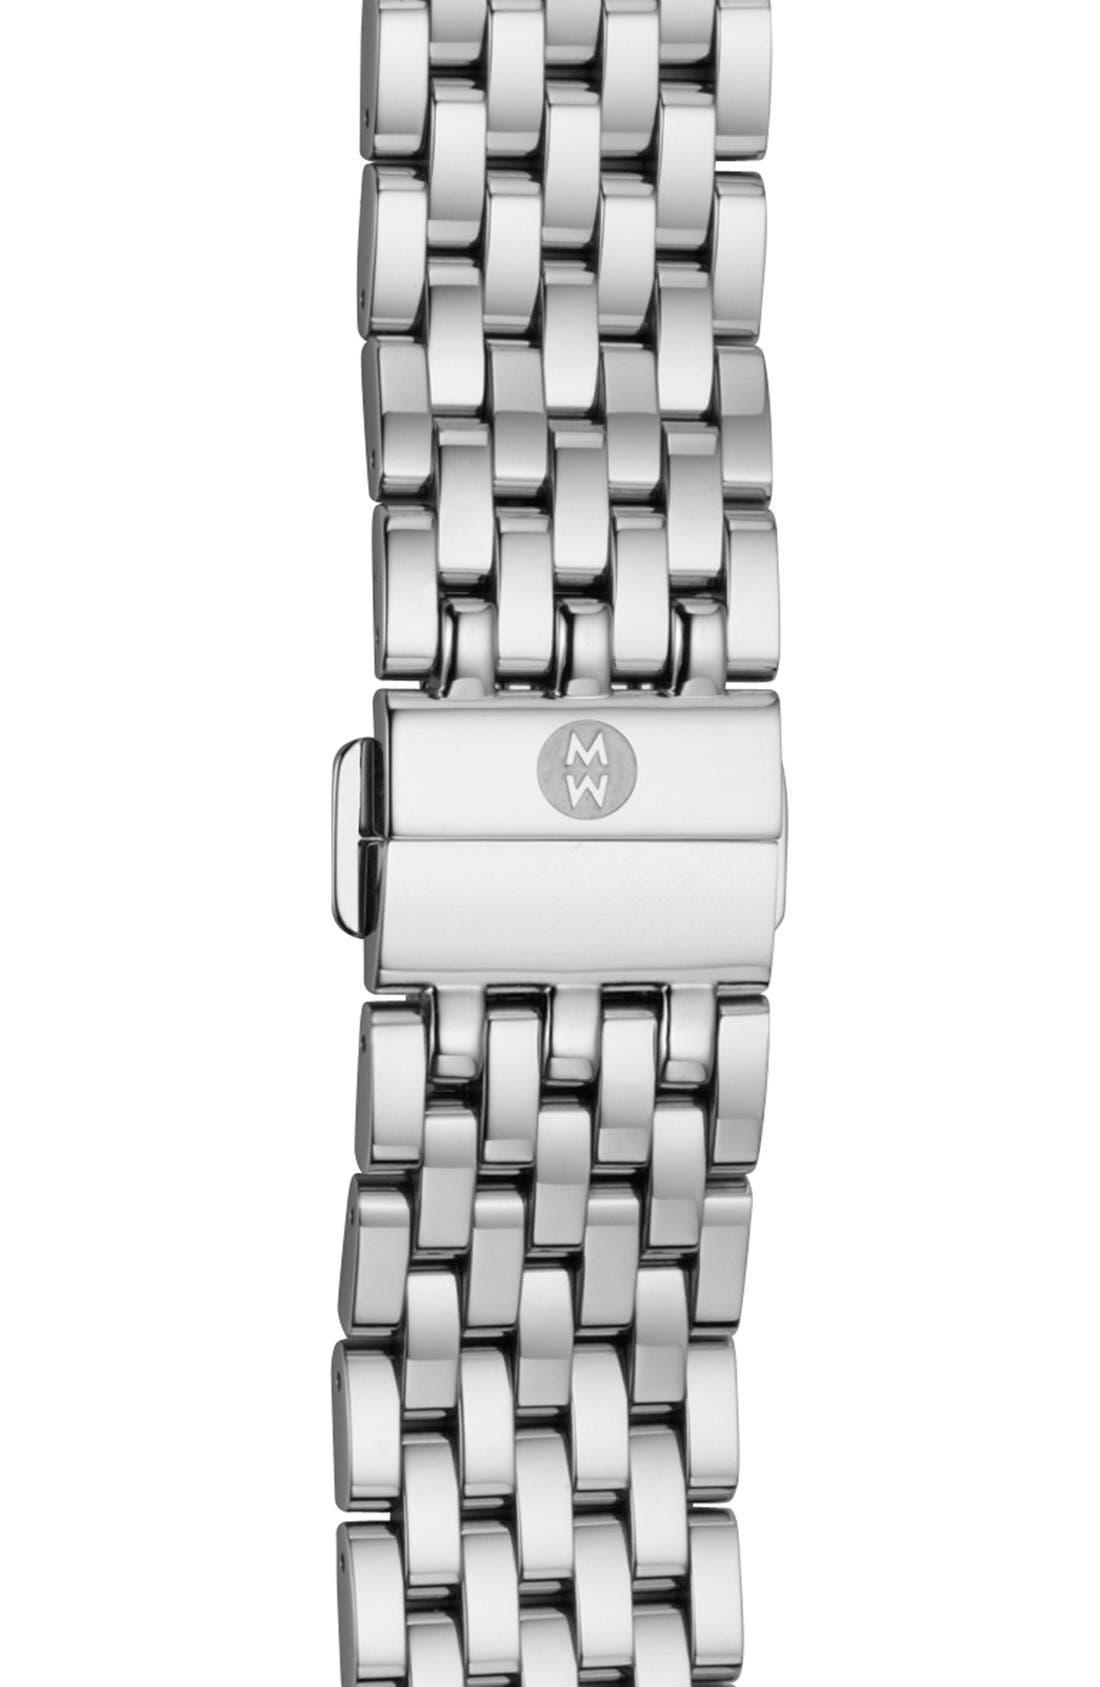 Main Image - MICHELE 'Fluette' 18mm Two Tone Bracelet Watch Band